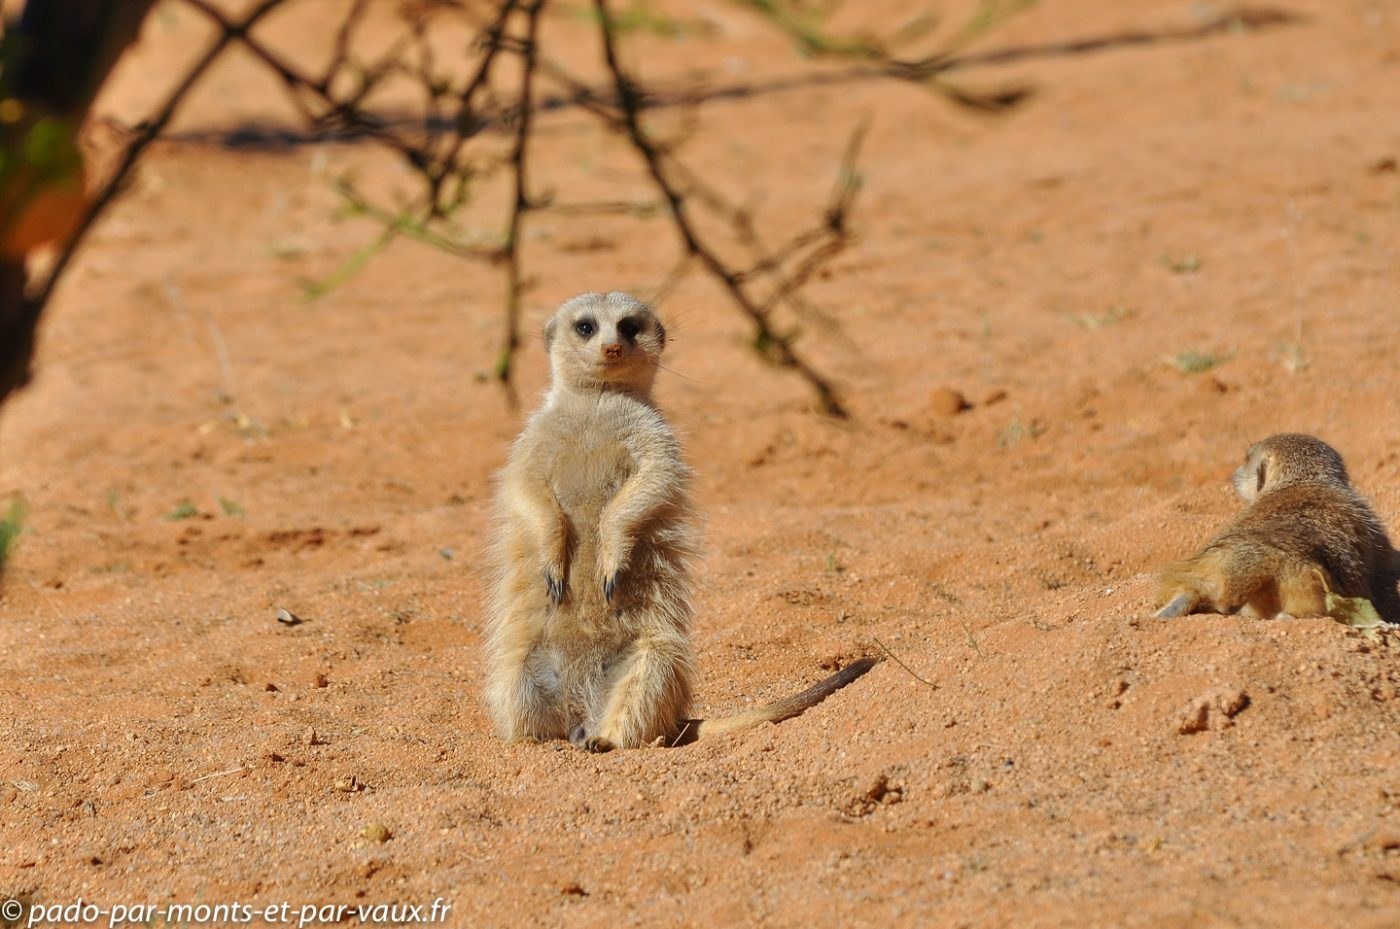 Namibie 2013 - Barchan Dune Retreat - Suricate